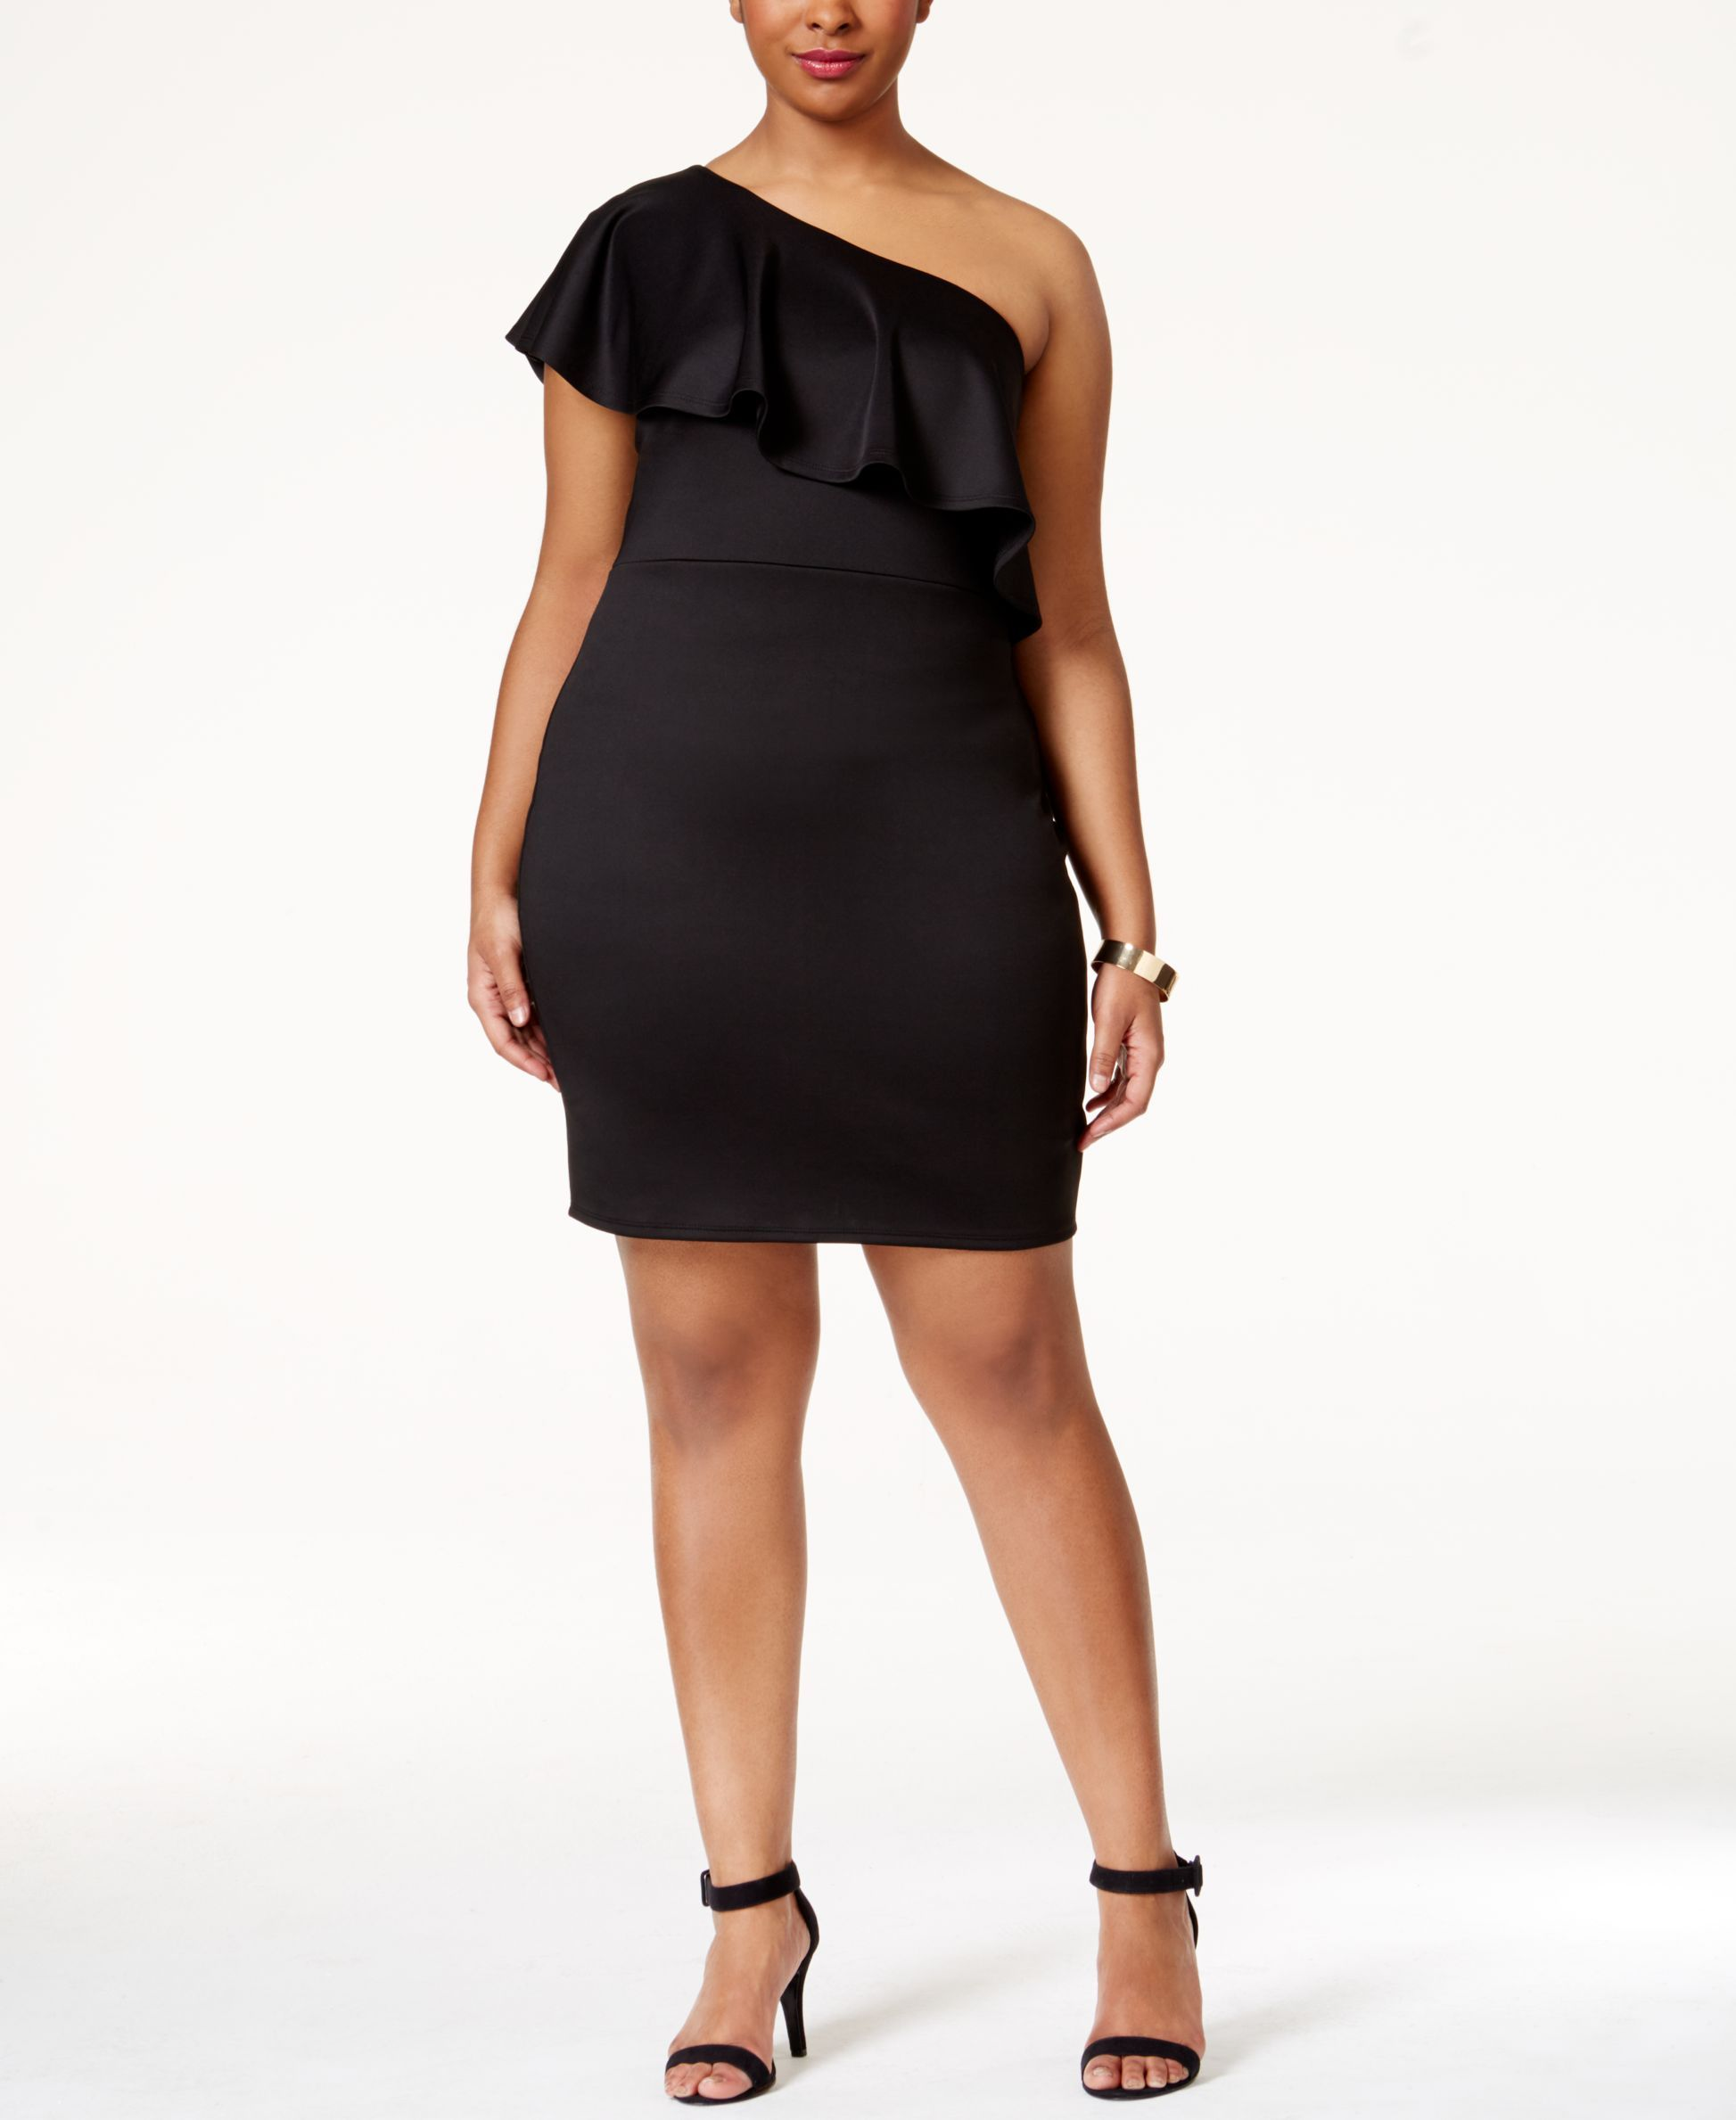 Soprano Plus Size Ruffled One-Shoulder Dress | SS17 | Pinterest